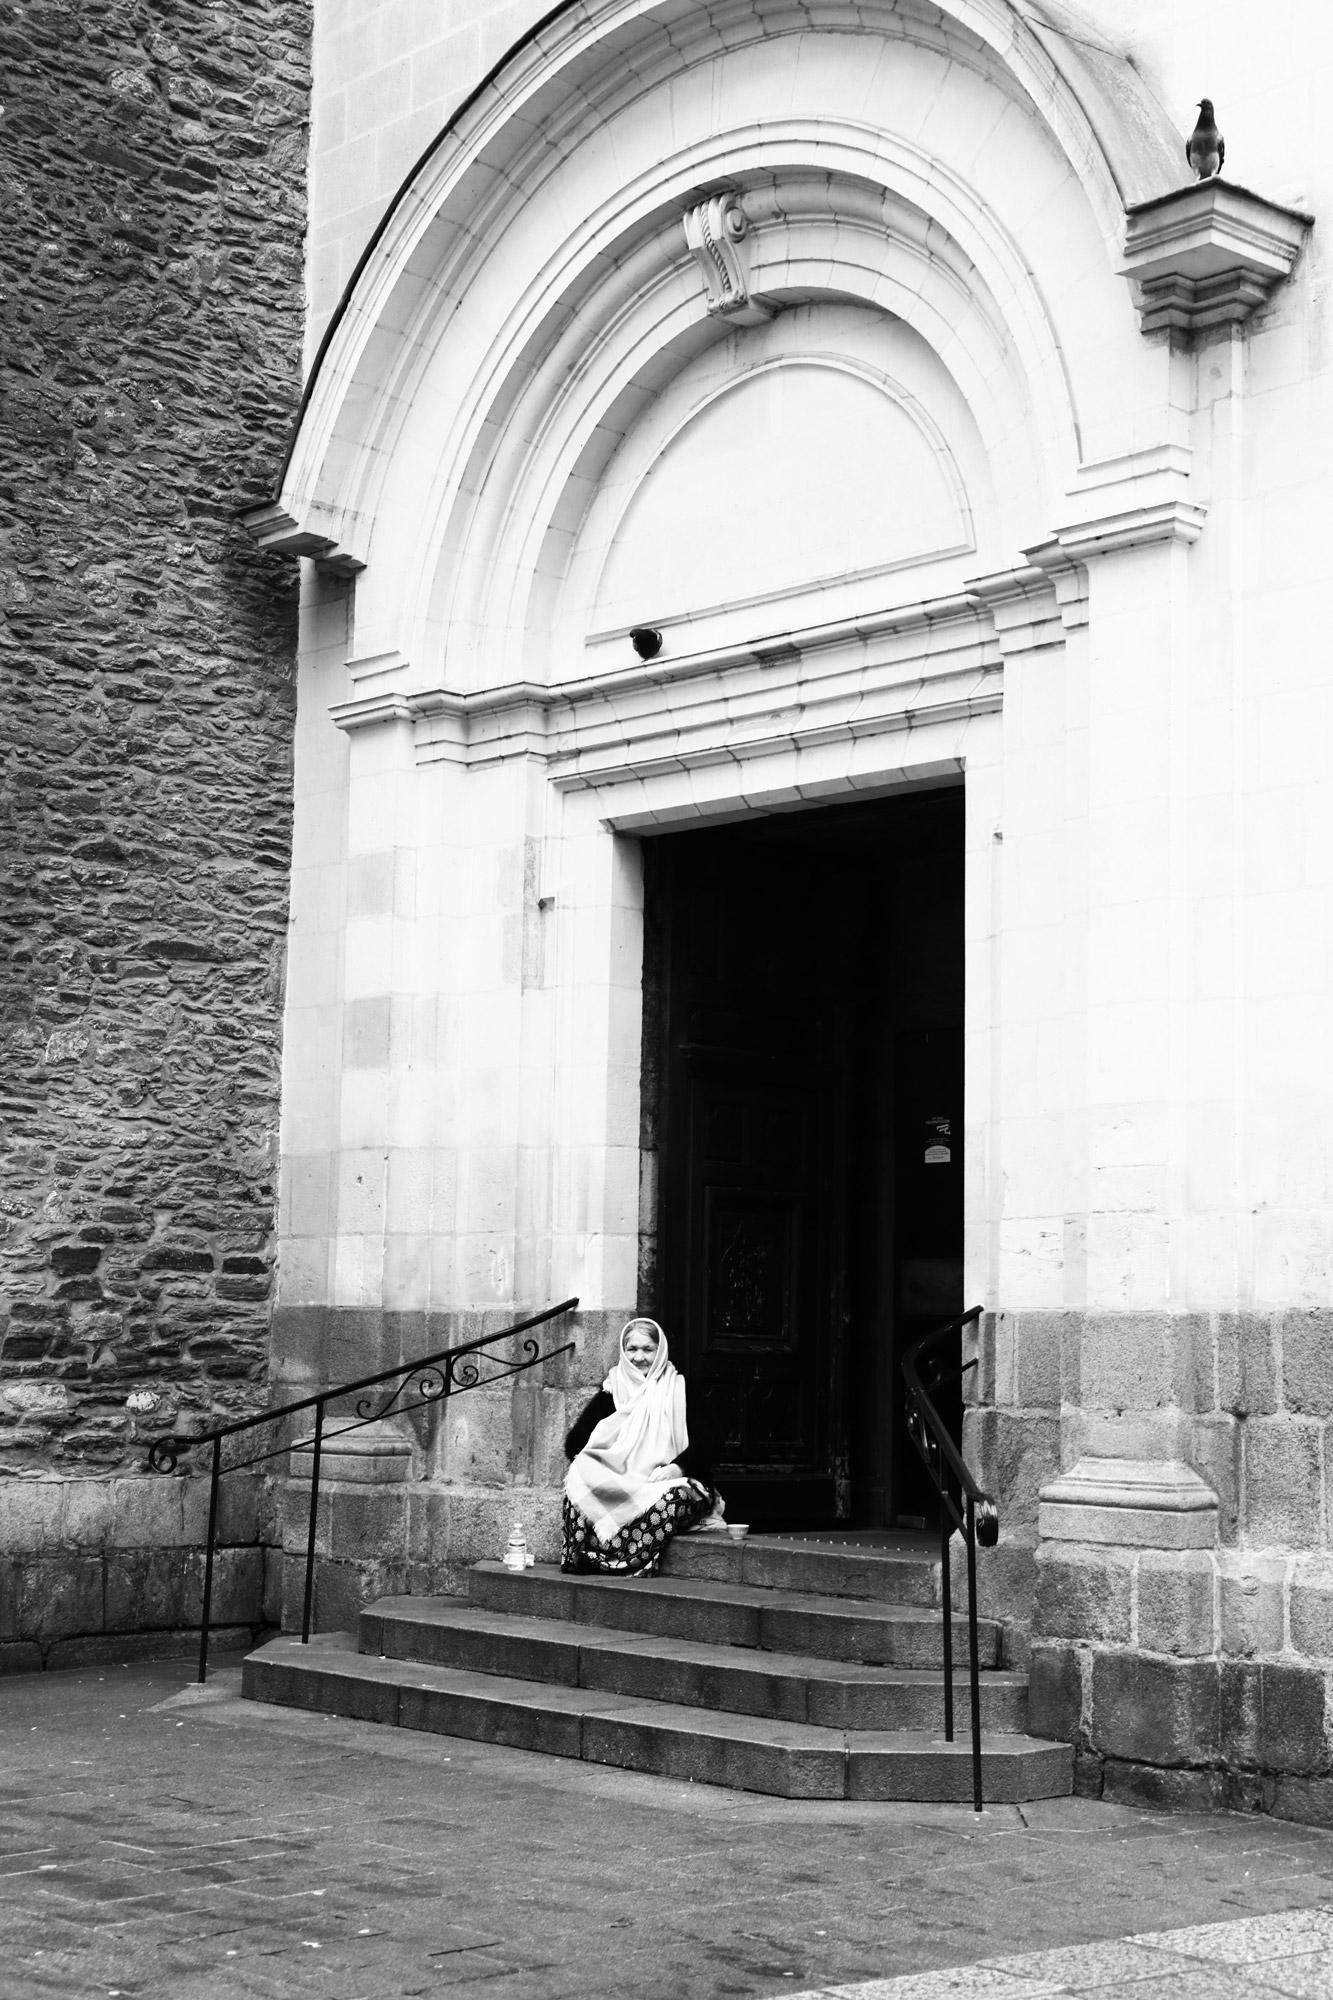 """Faith and Street"" - Église Sainte-Croix, Nantes. ©Clémence Rougetet"